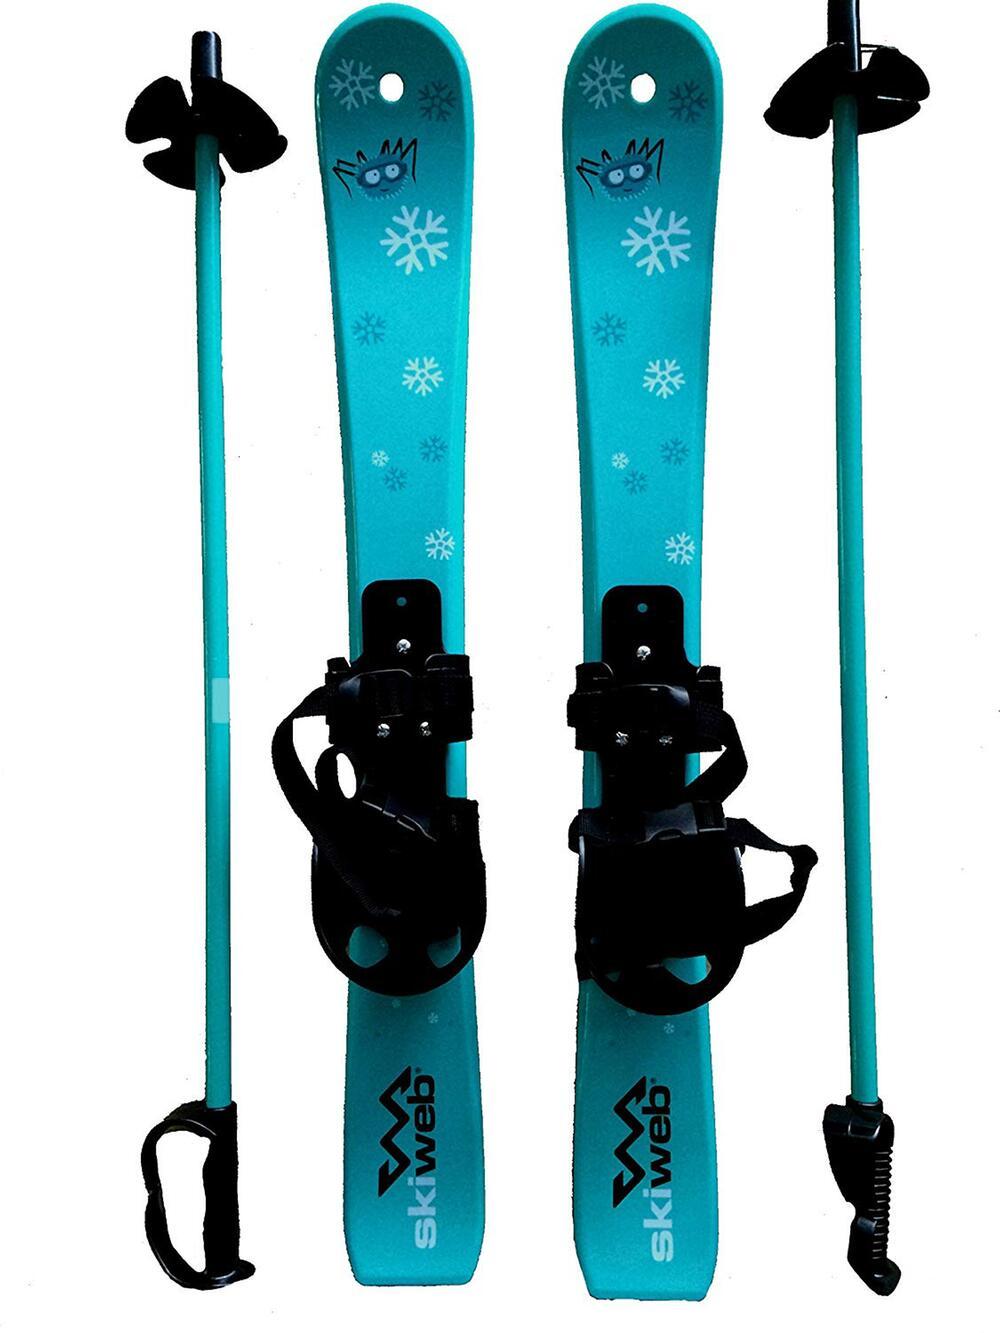 beste skier, beste ski, beste snowboards, bestes snowboard, winter, wintersport, piste